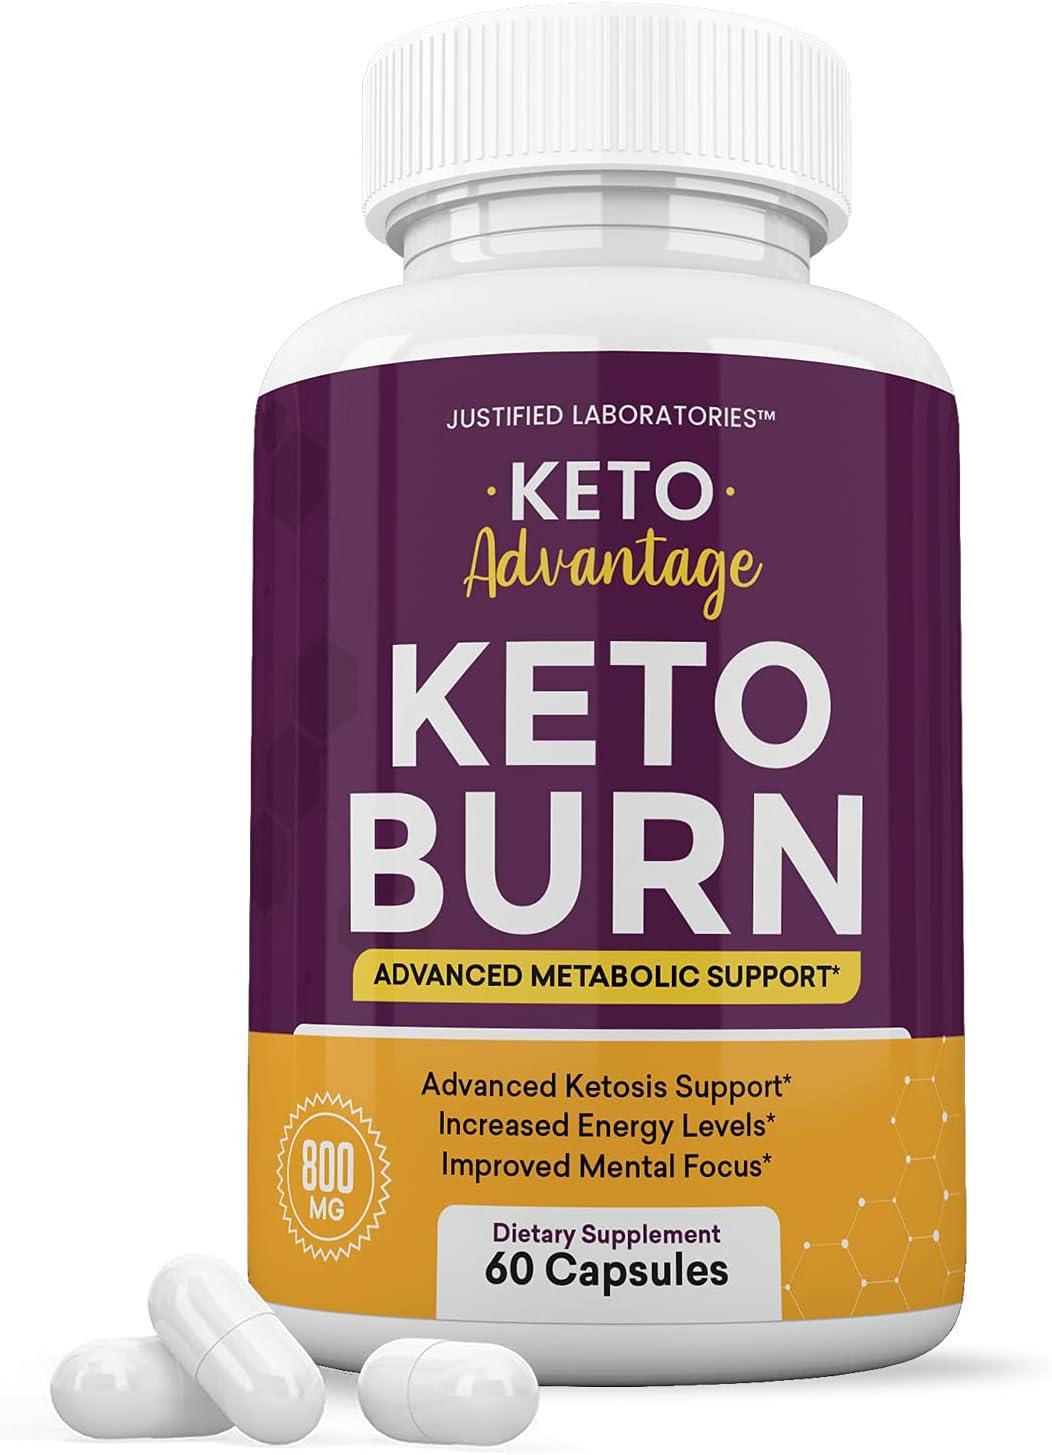 Keto Advantage Burn Pills Animer and price revision Includes Ranking TOP12 Cider goBH Vinegar Apple